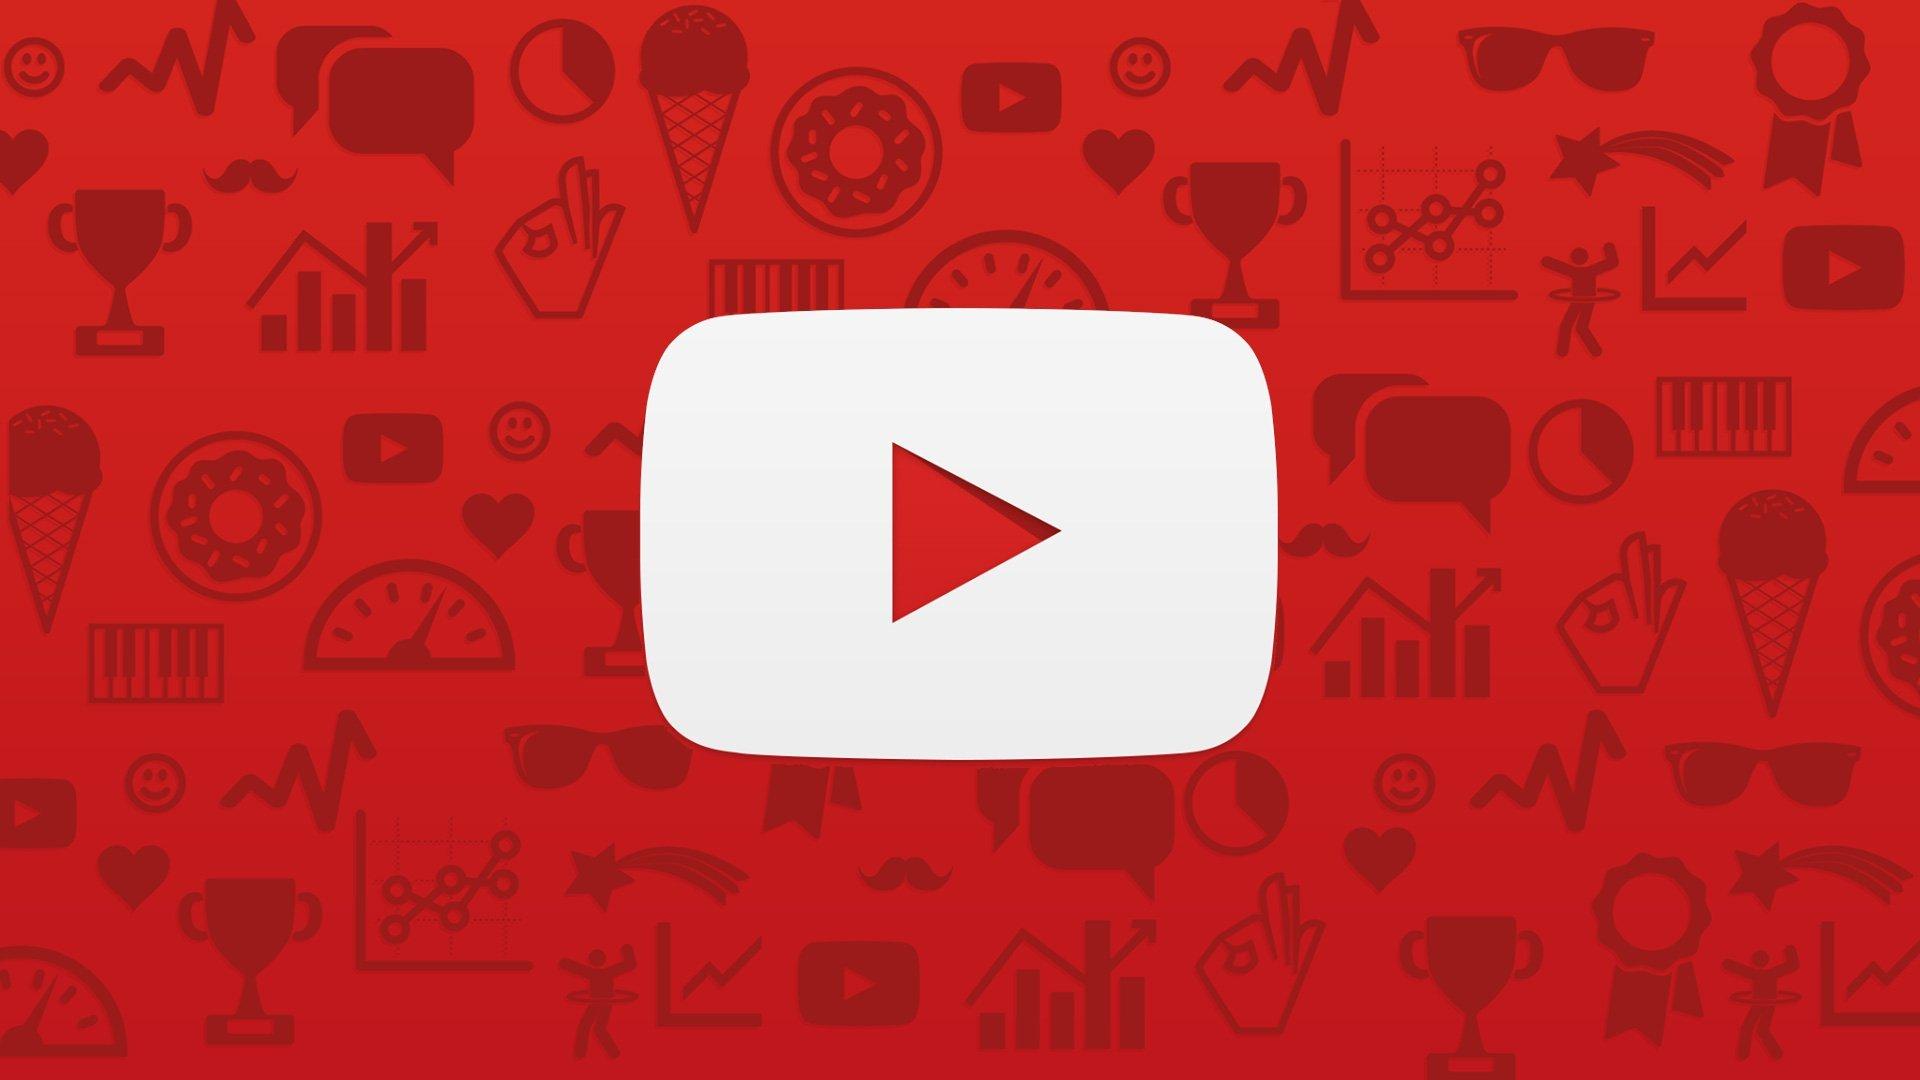 youtube iconsbkgd 1920